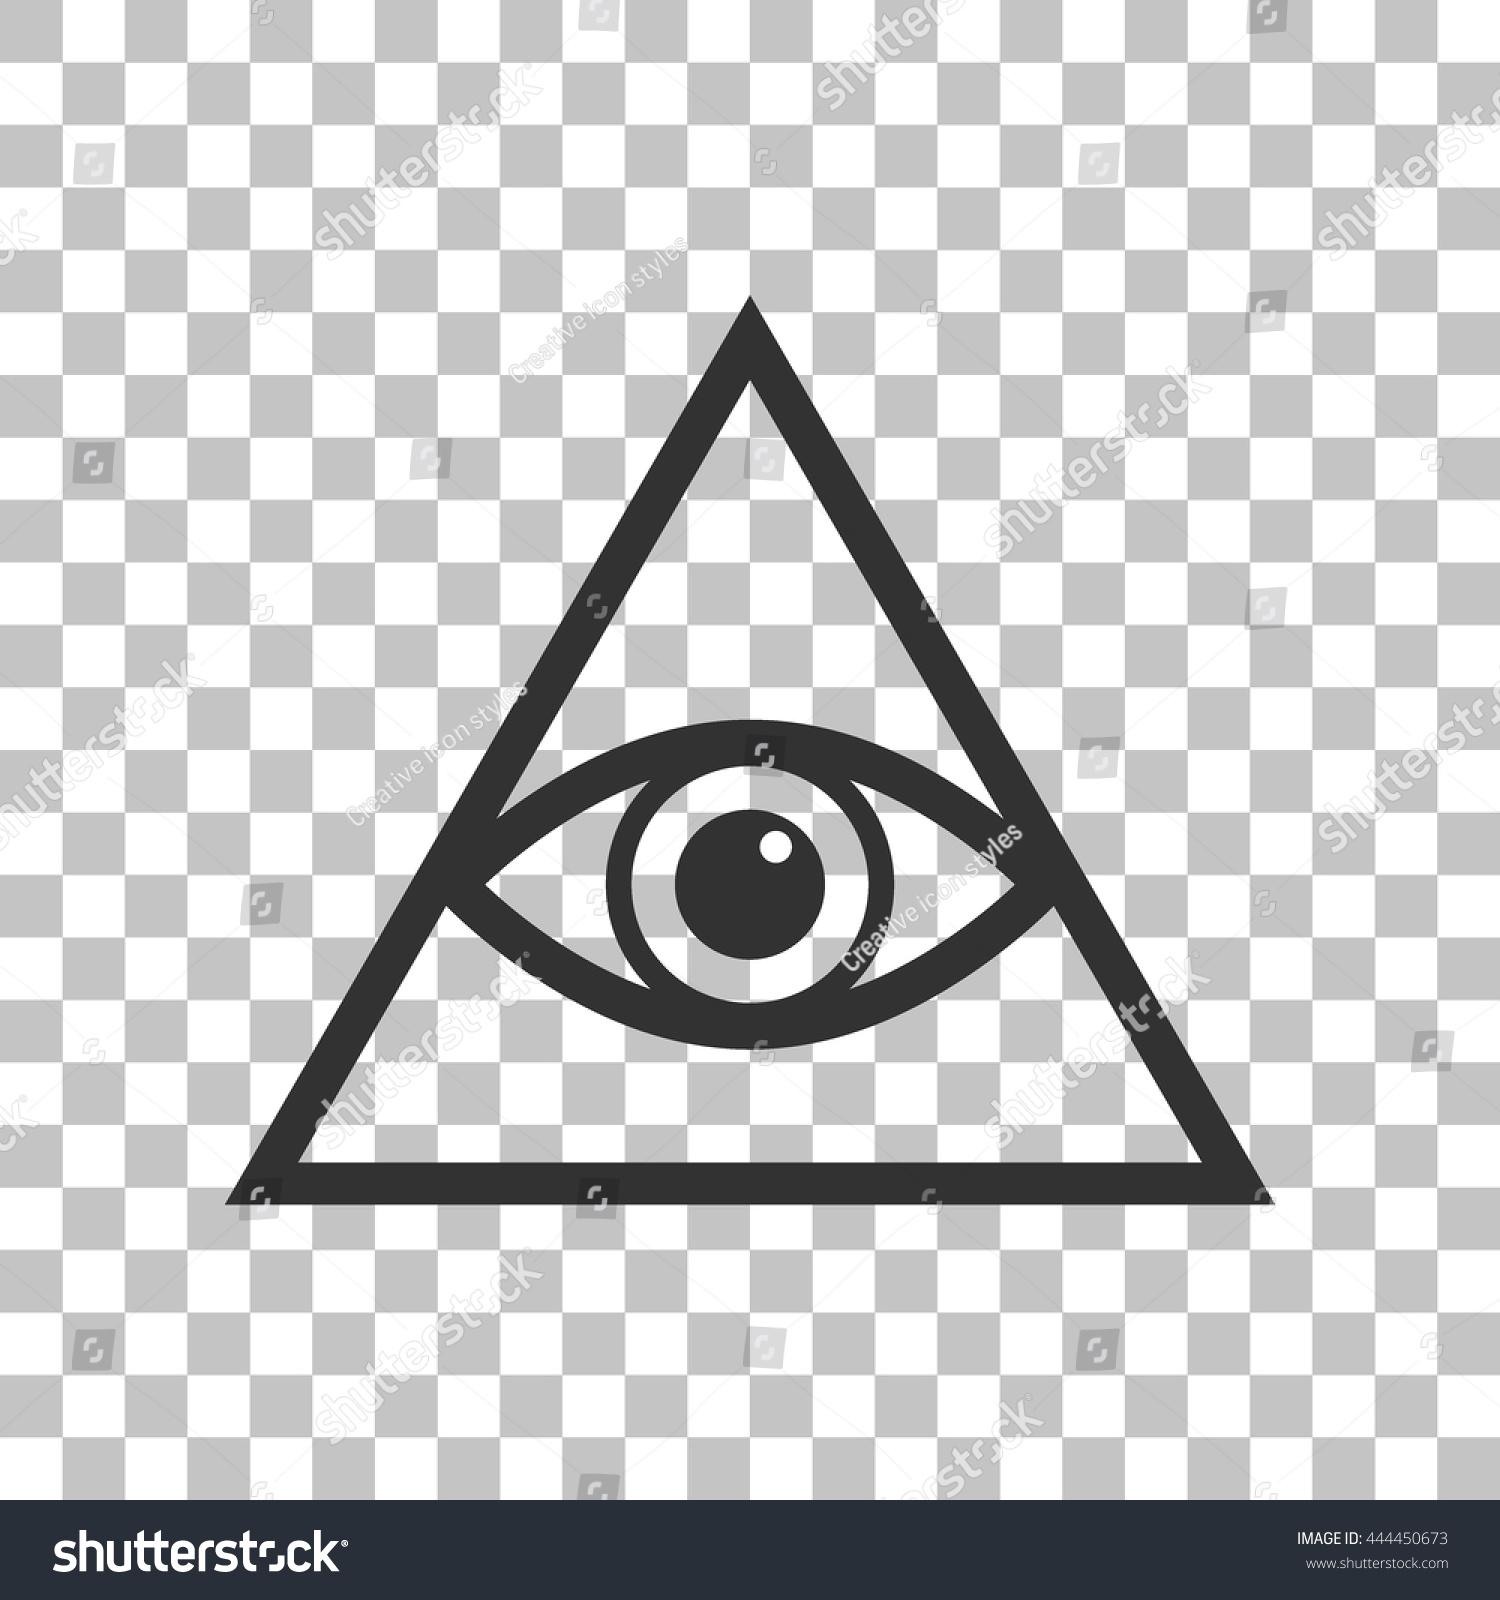 All Seeing Eye Pyramid Symbol Freemason And Spiritual Dark Gray Icon On Transparent Background